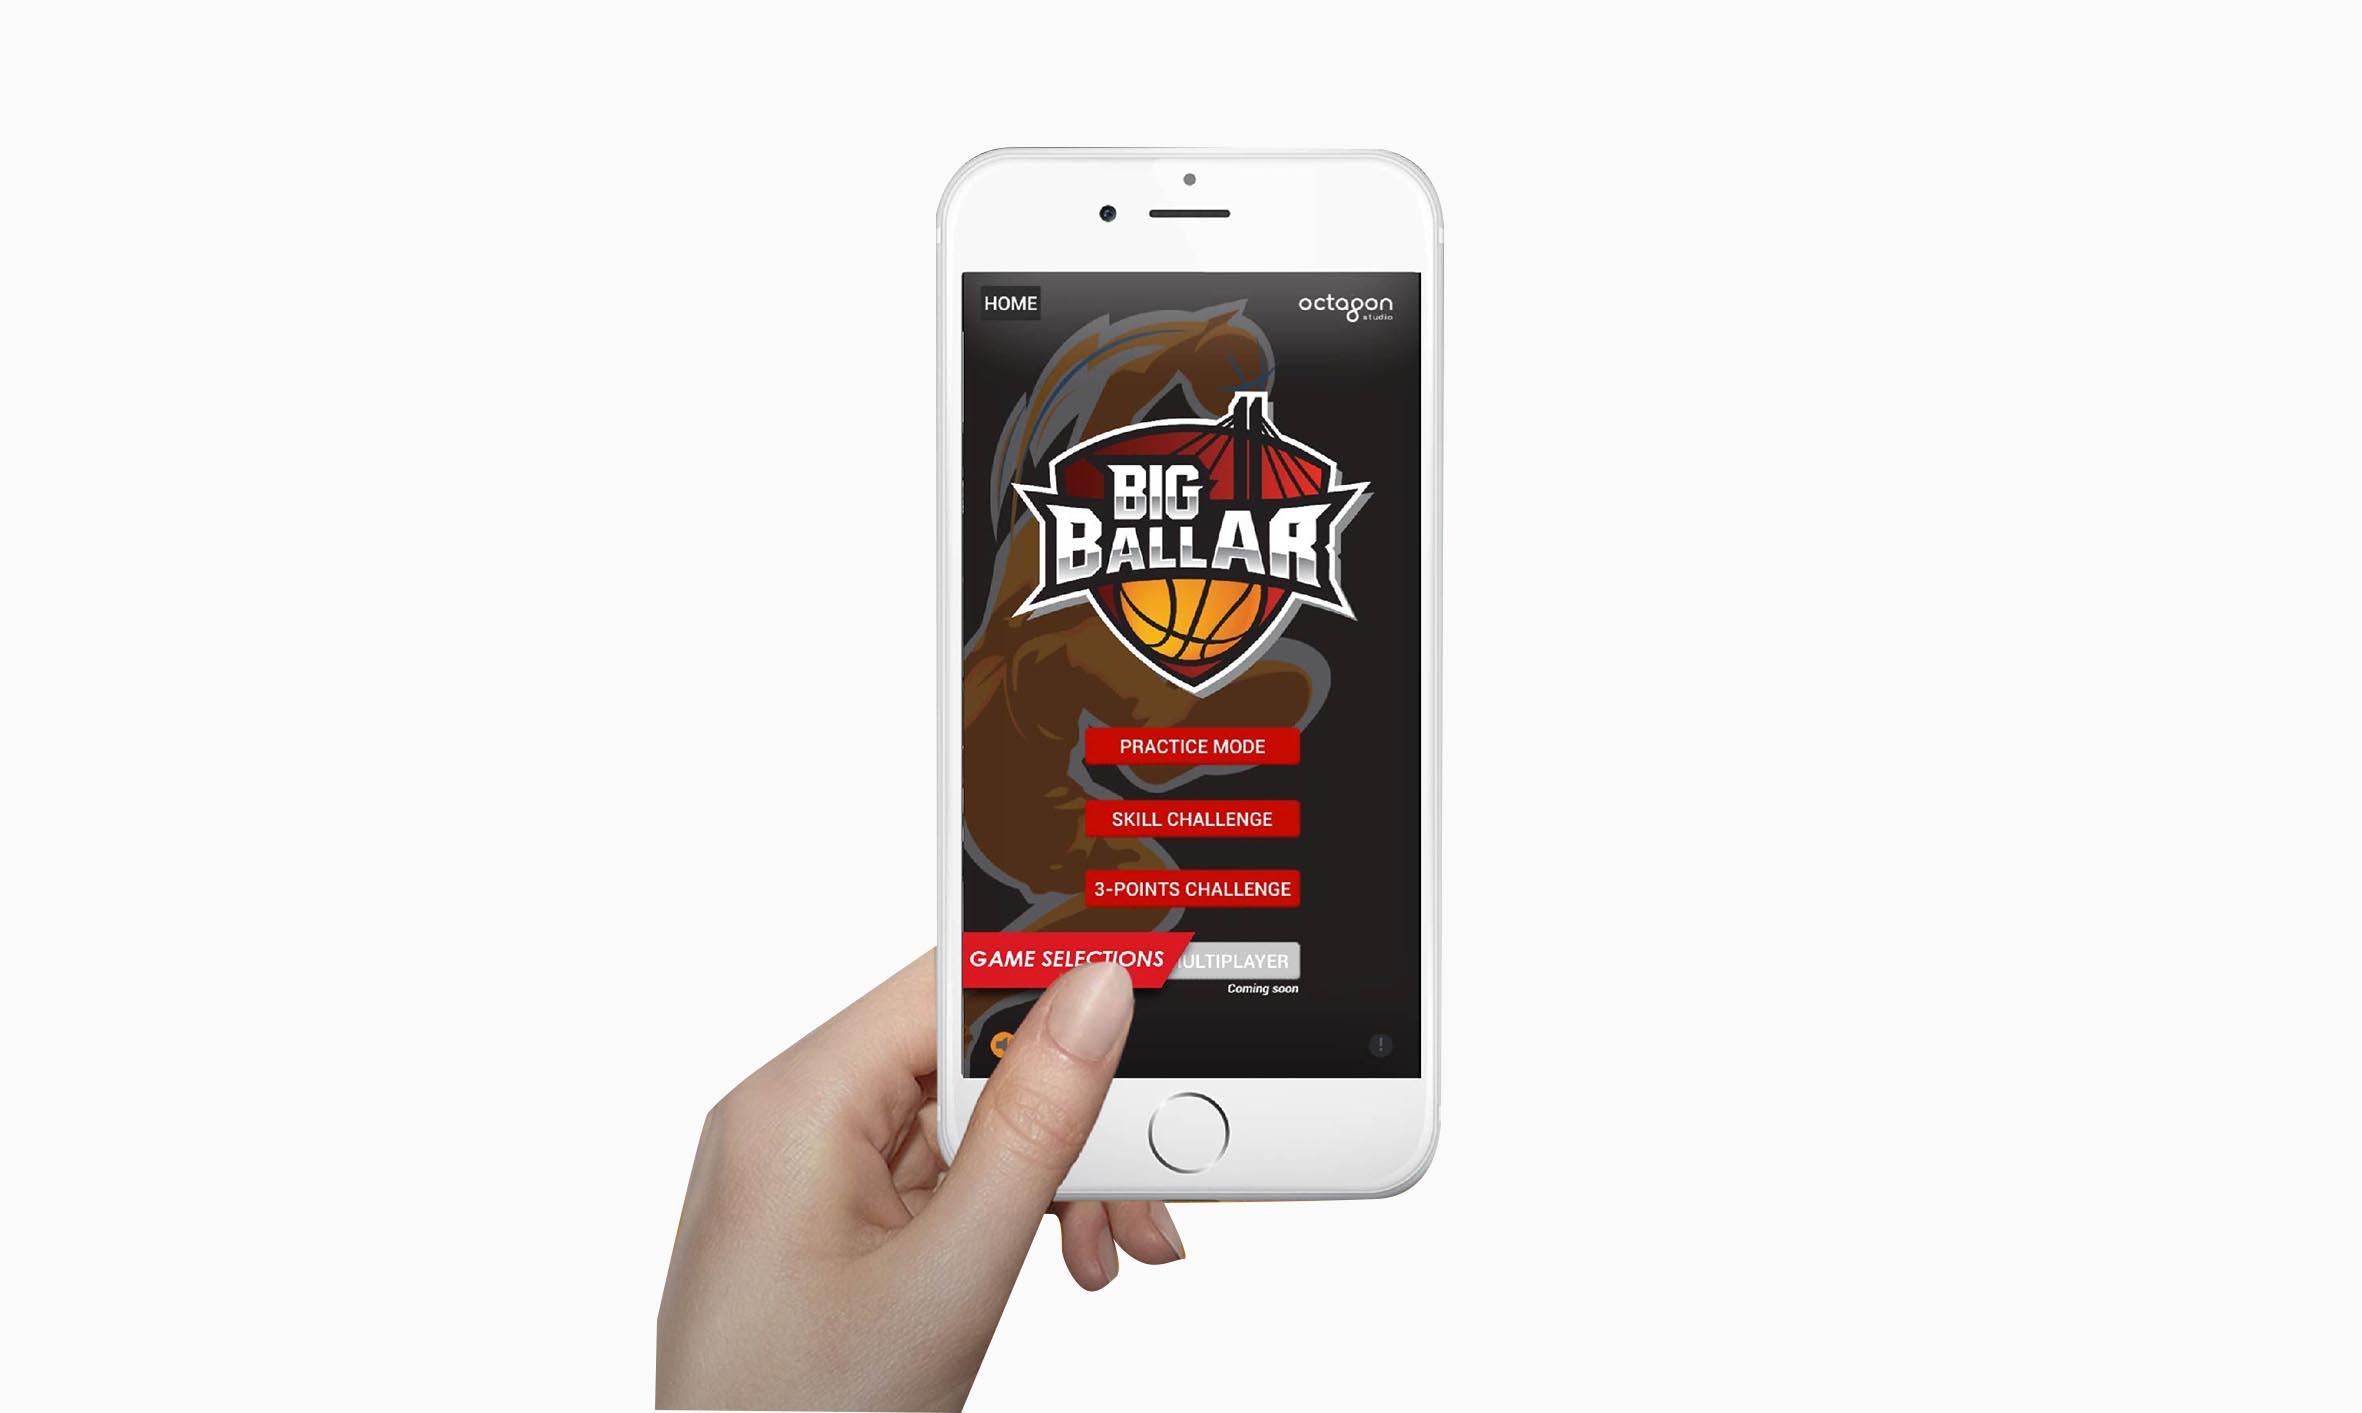 Big Ball AR App